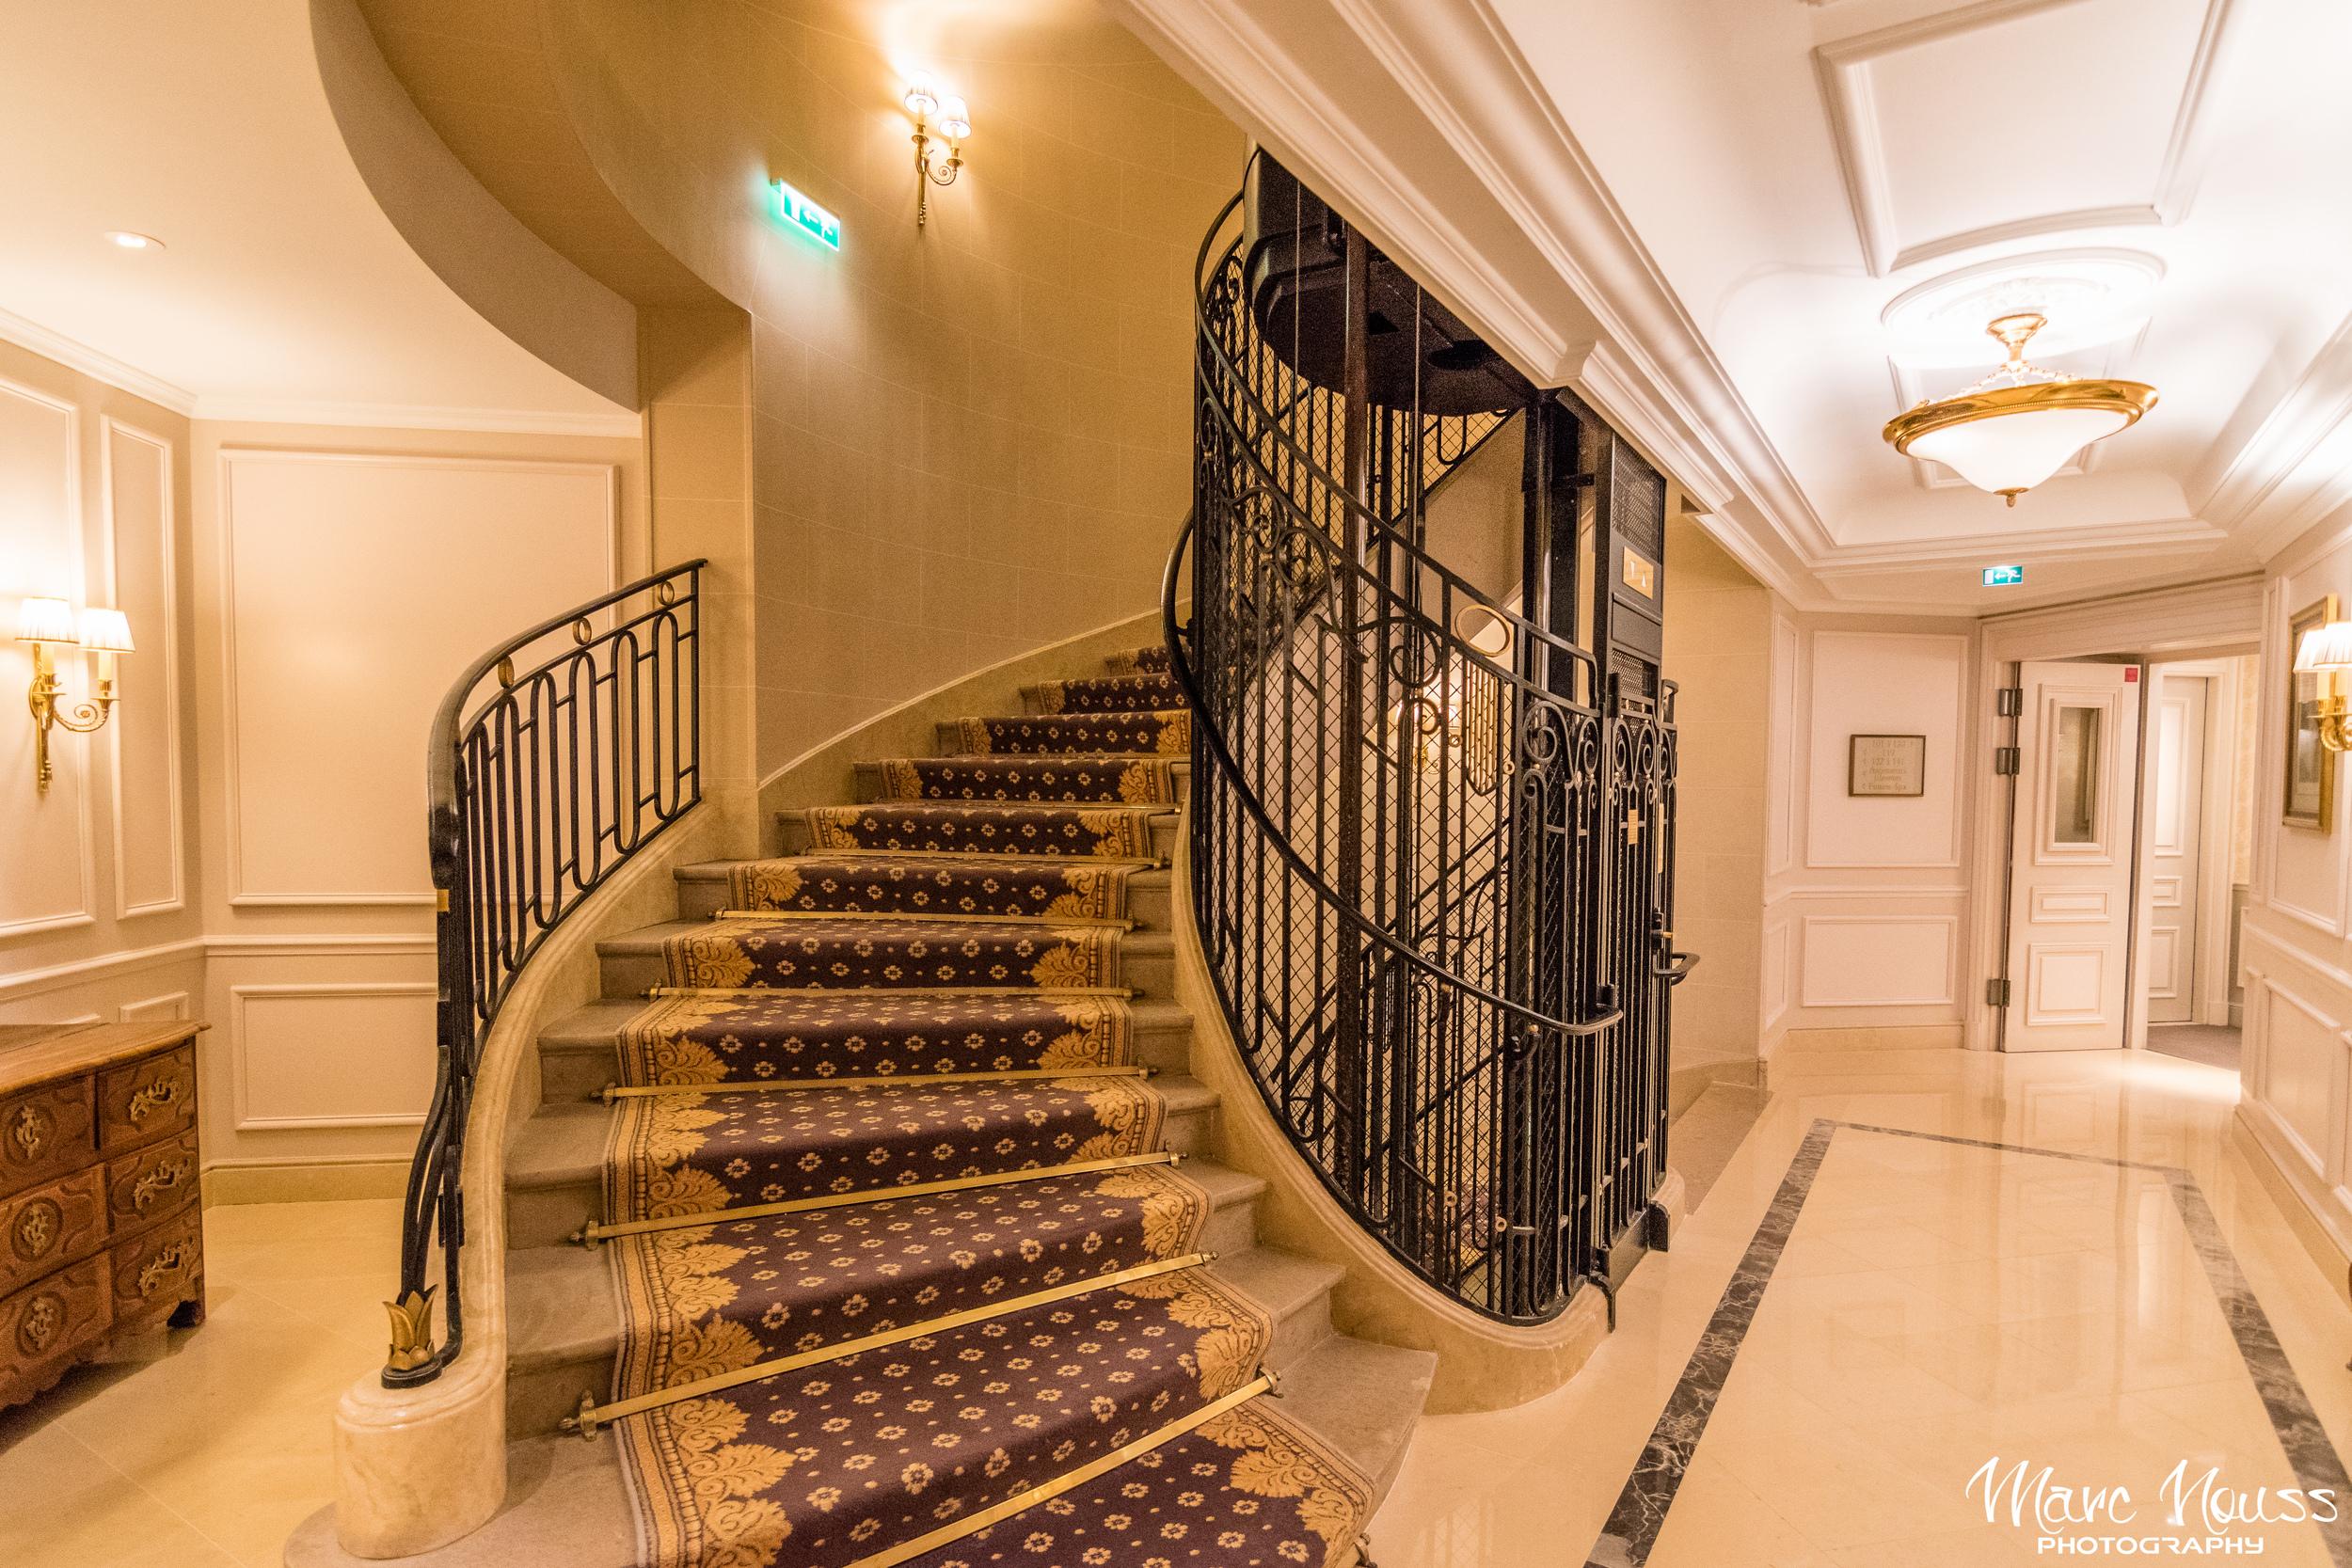 Beautiful old fashioned elevator